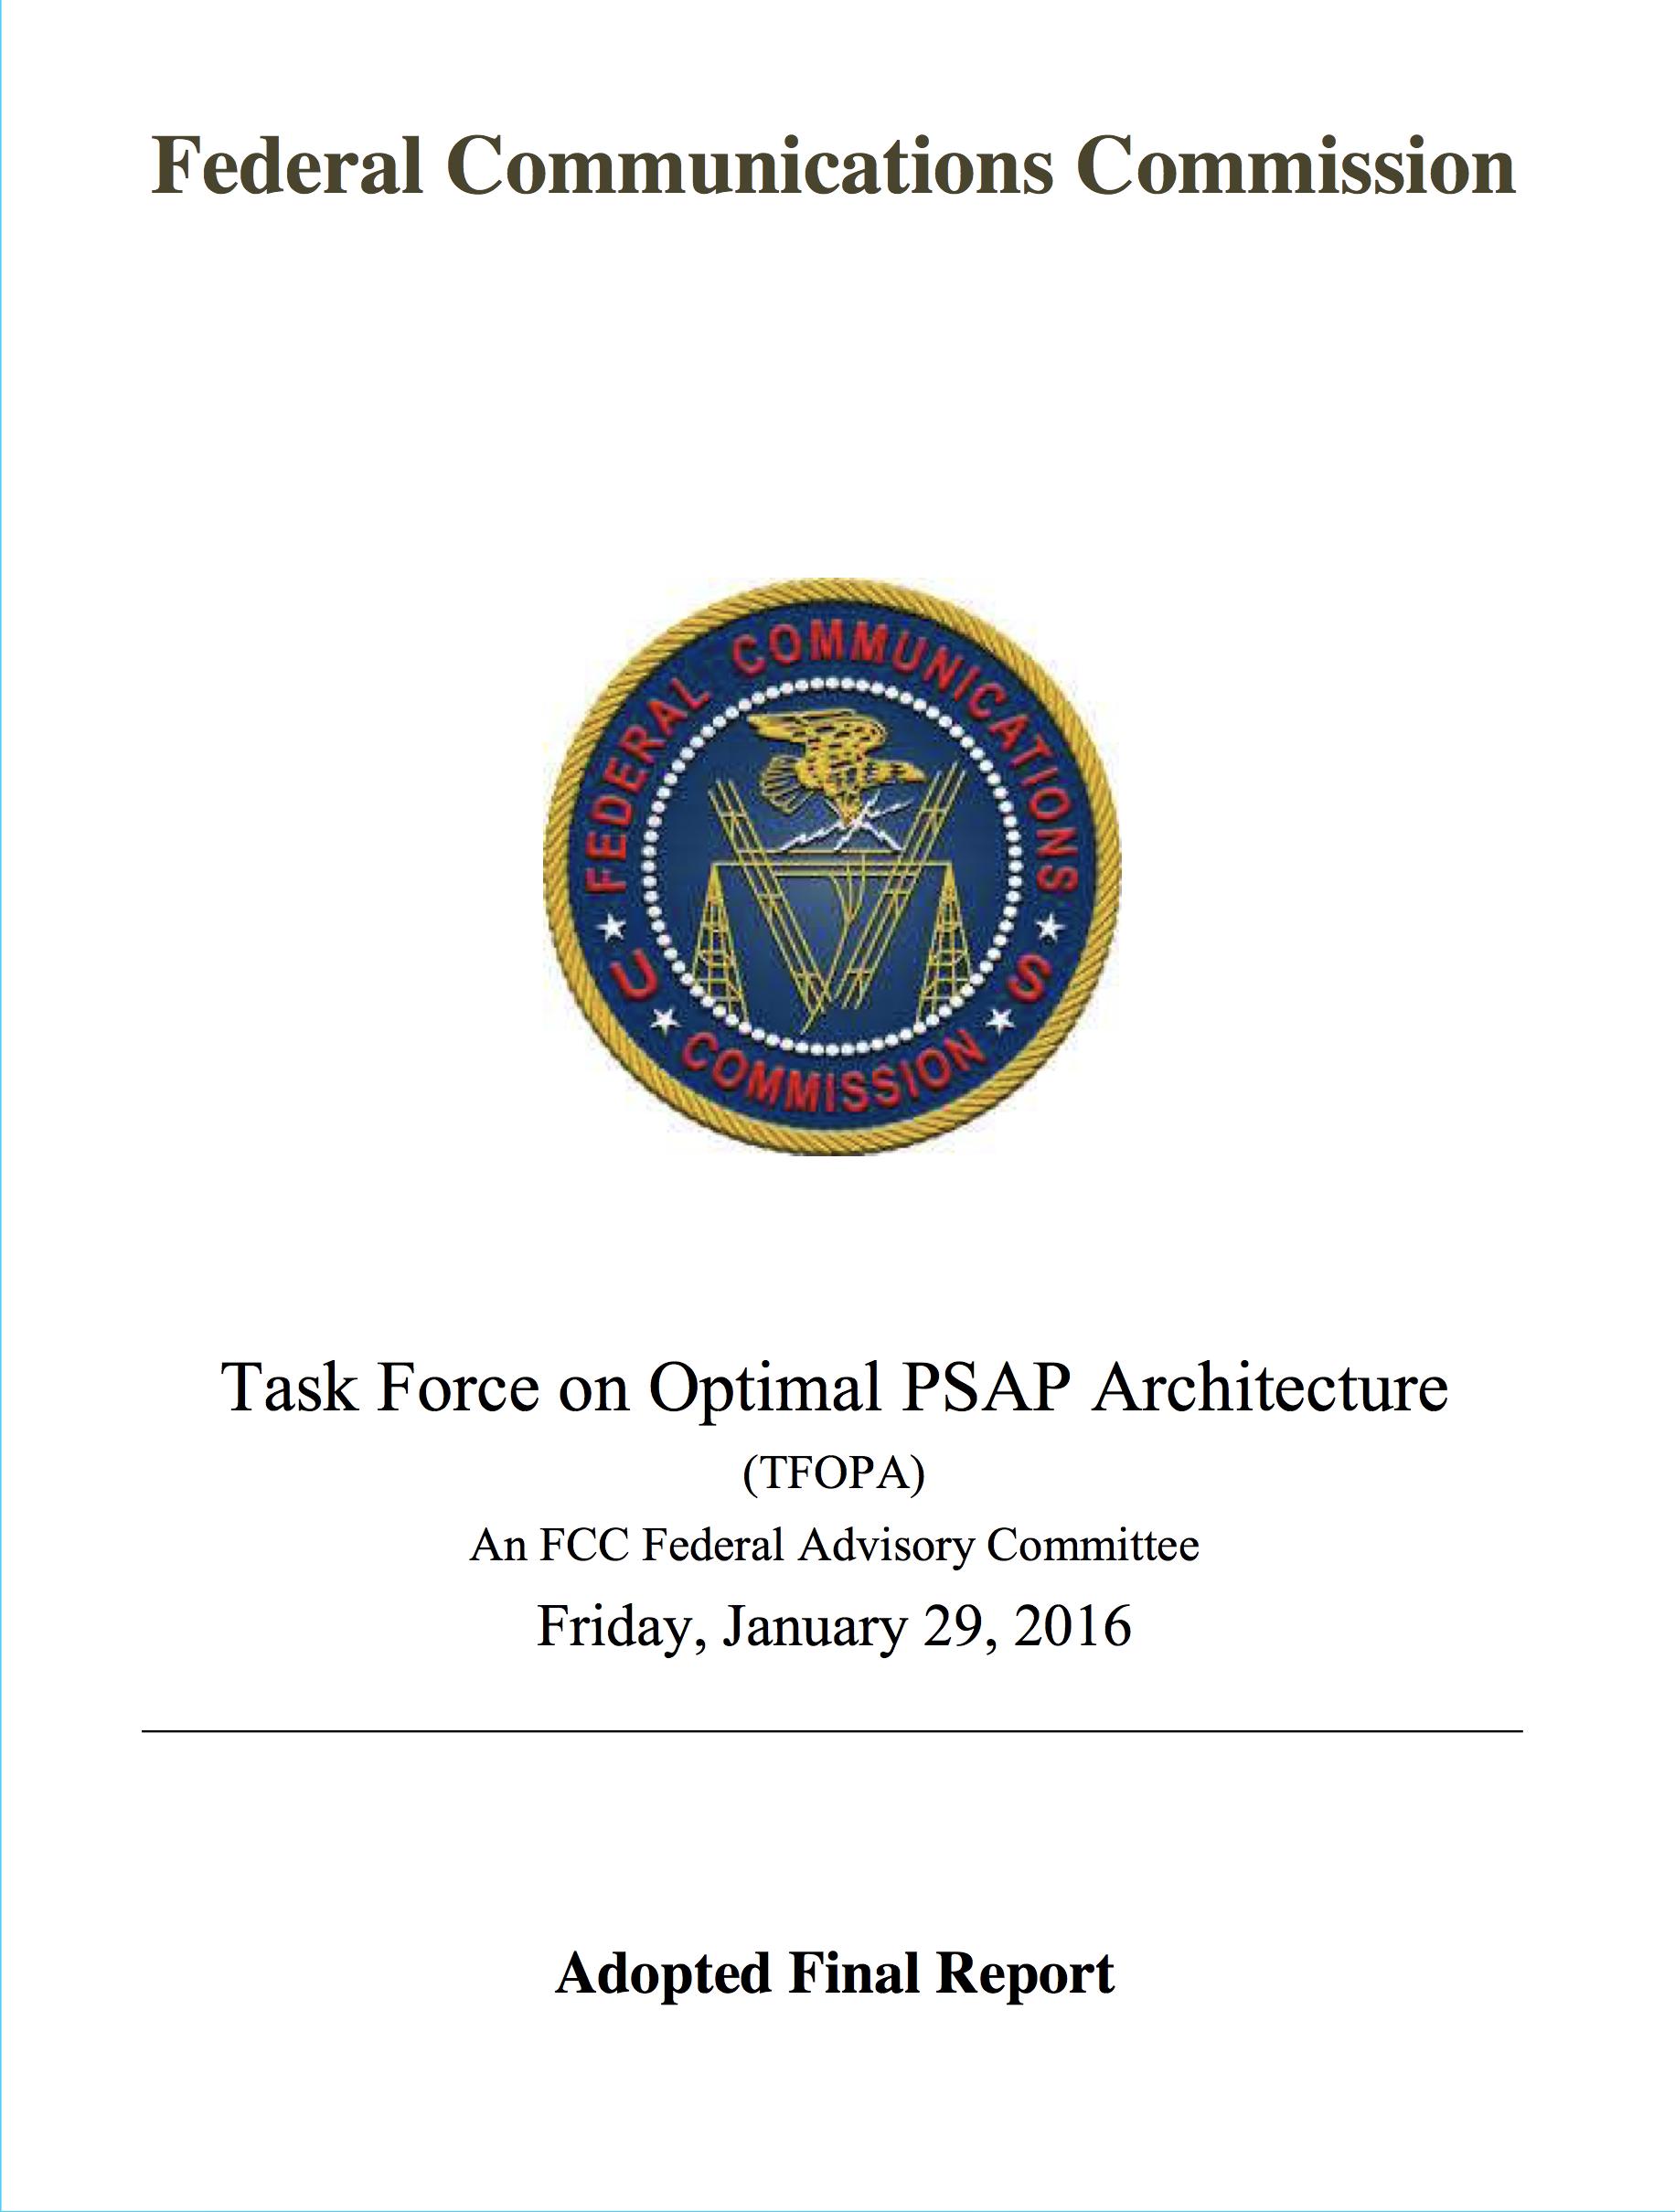 FCC: Optimal PSAP Architecture